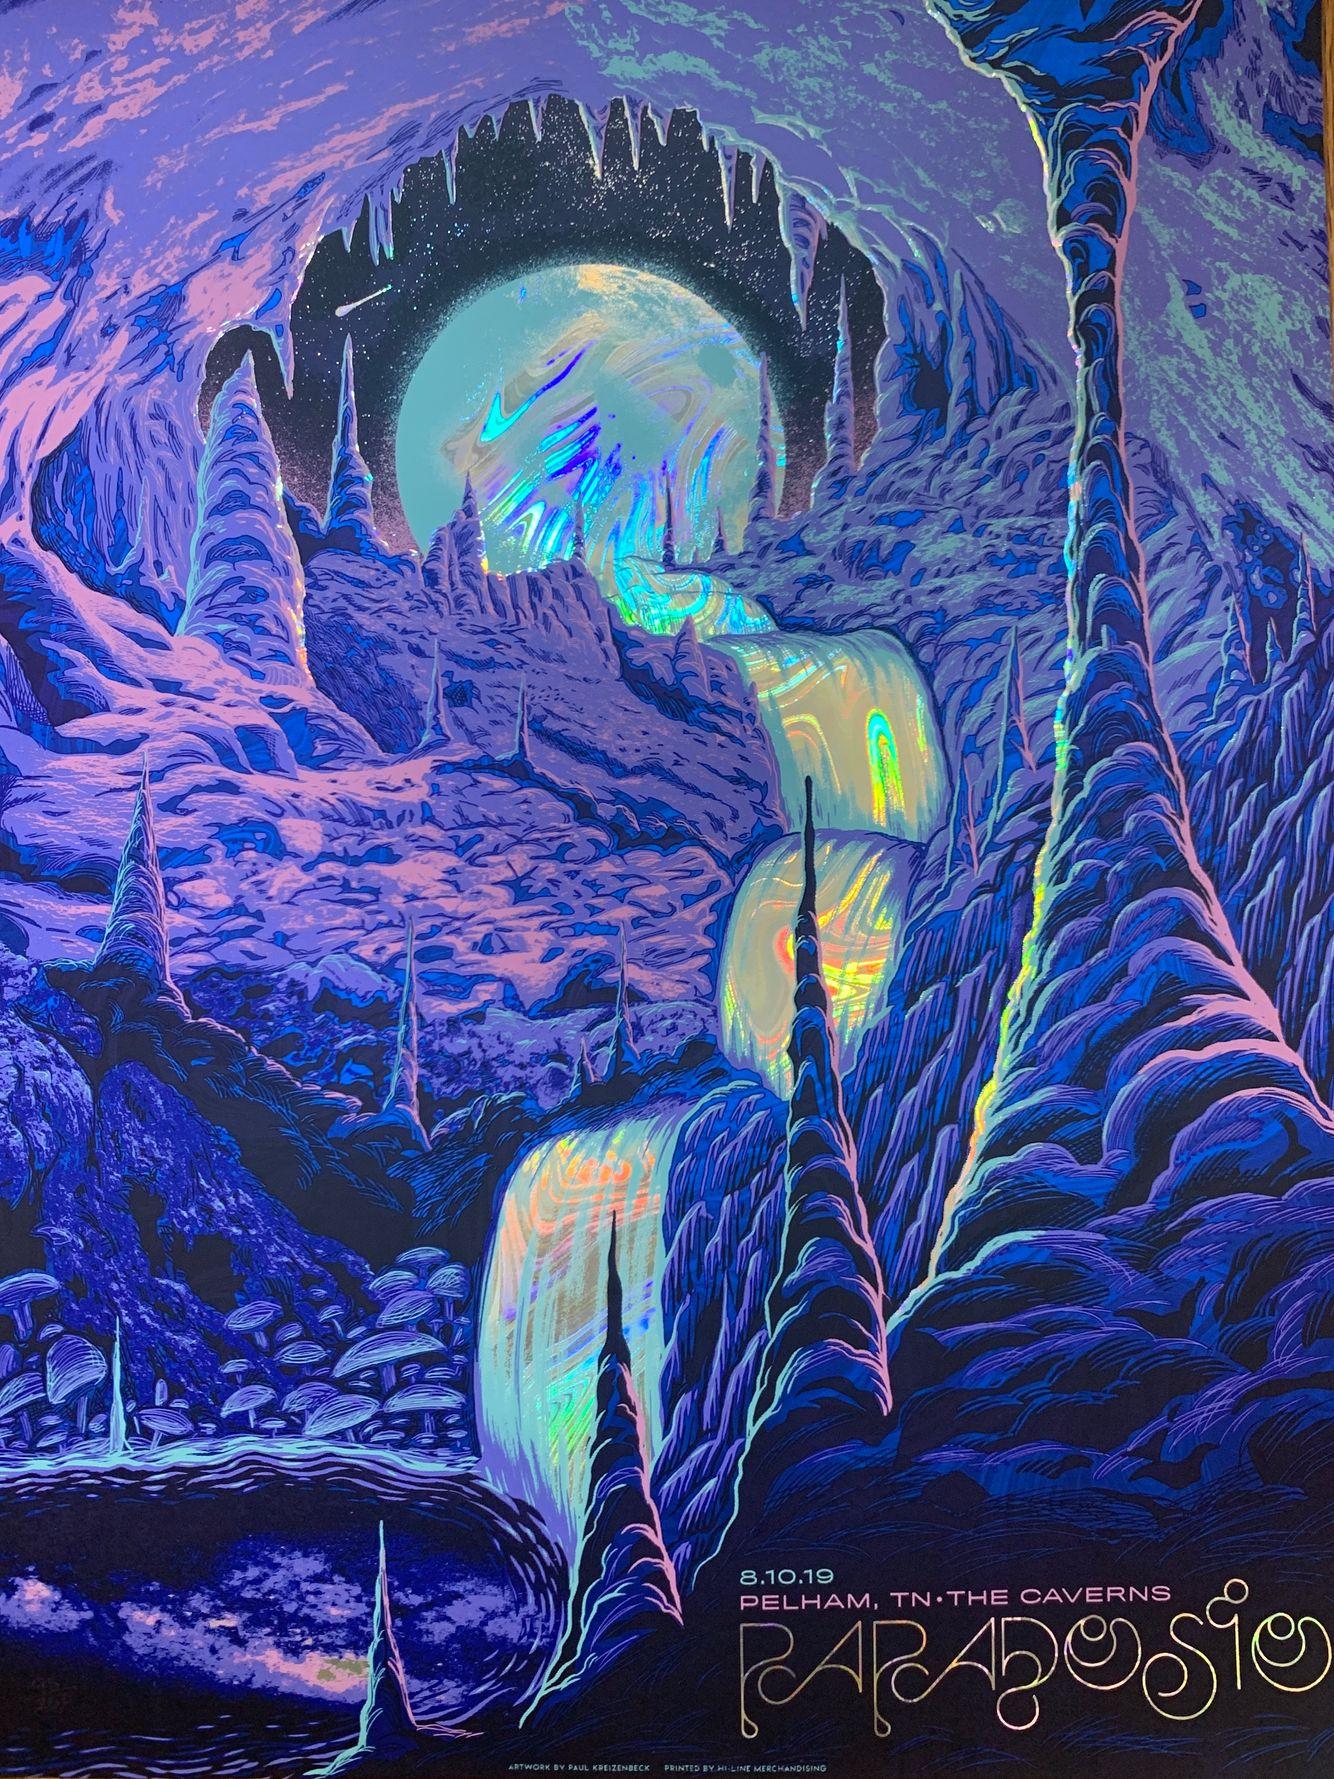 Papadosio - The Caverns - Paul Kreizenbeck Design & Illustration.jpg